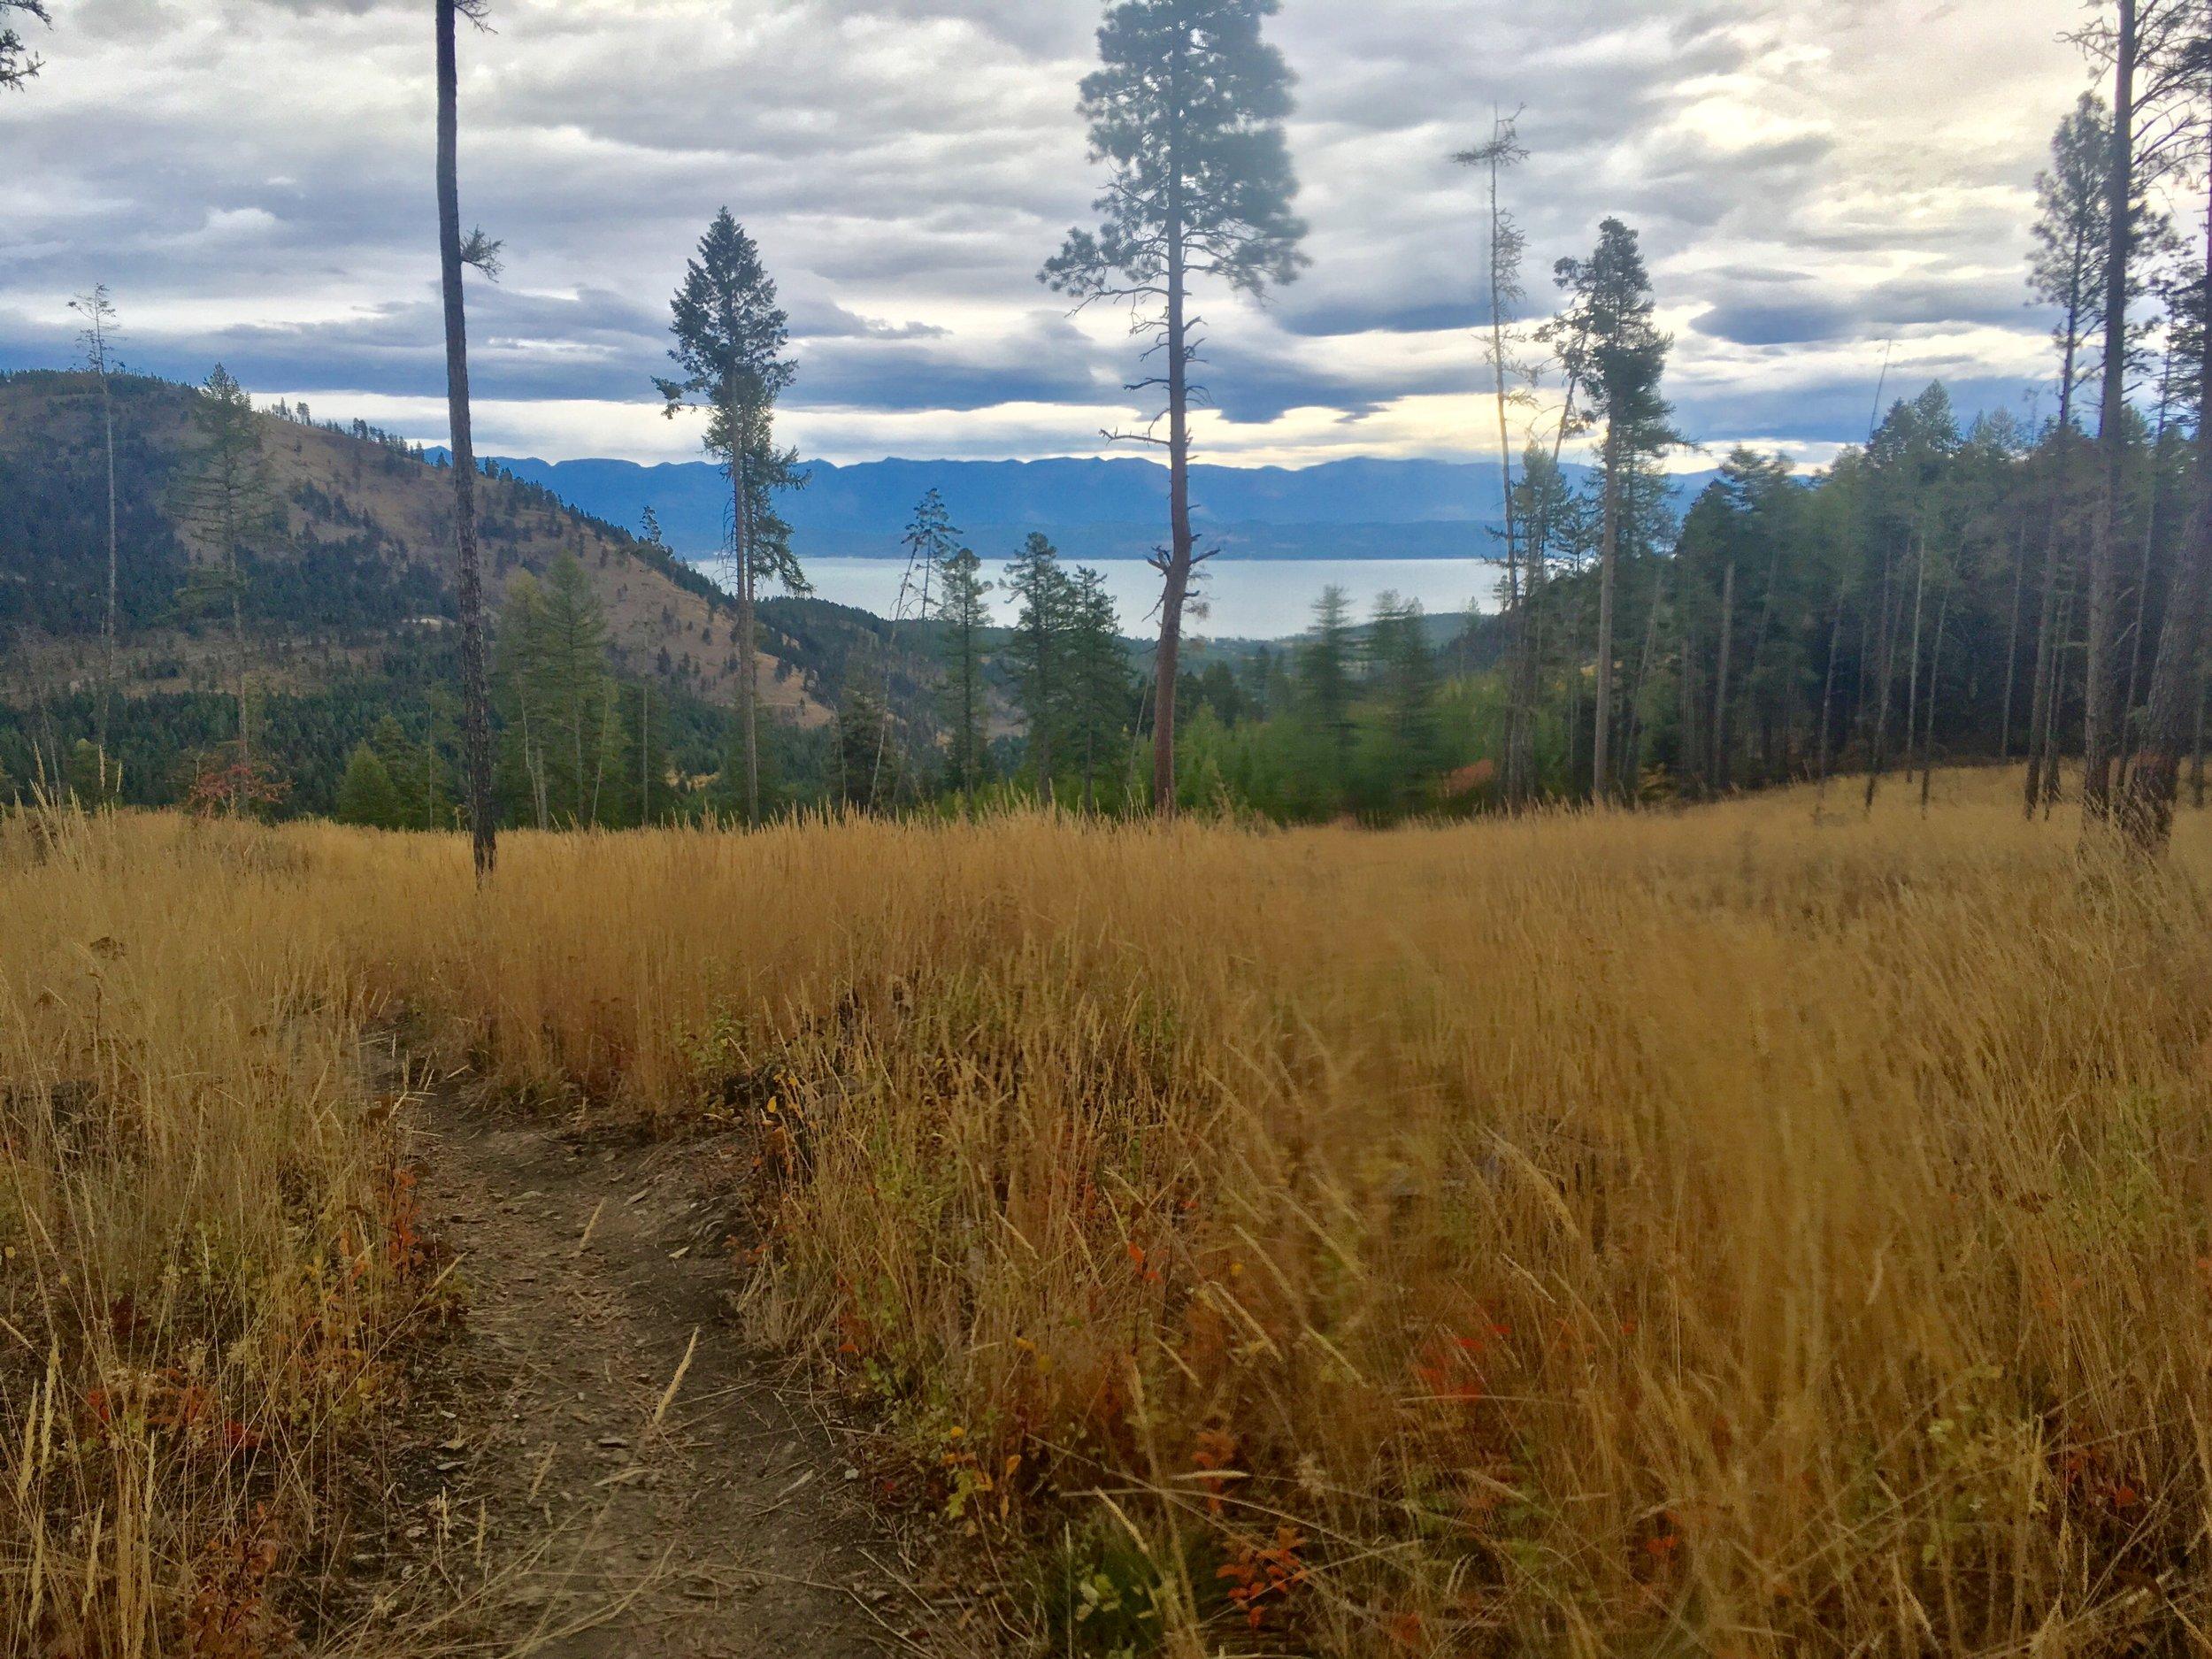 foys to blacktail trails trail marathon ftbtIMG_1720.JPG